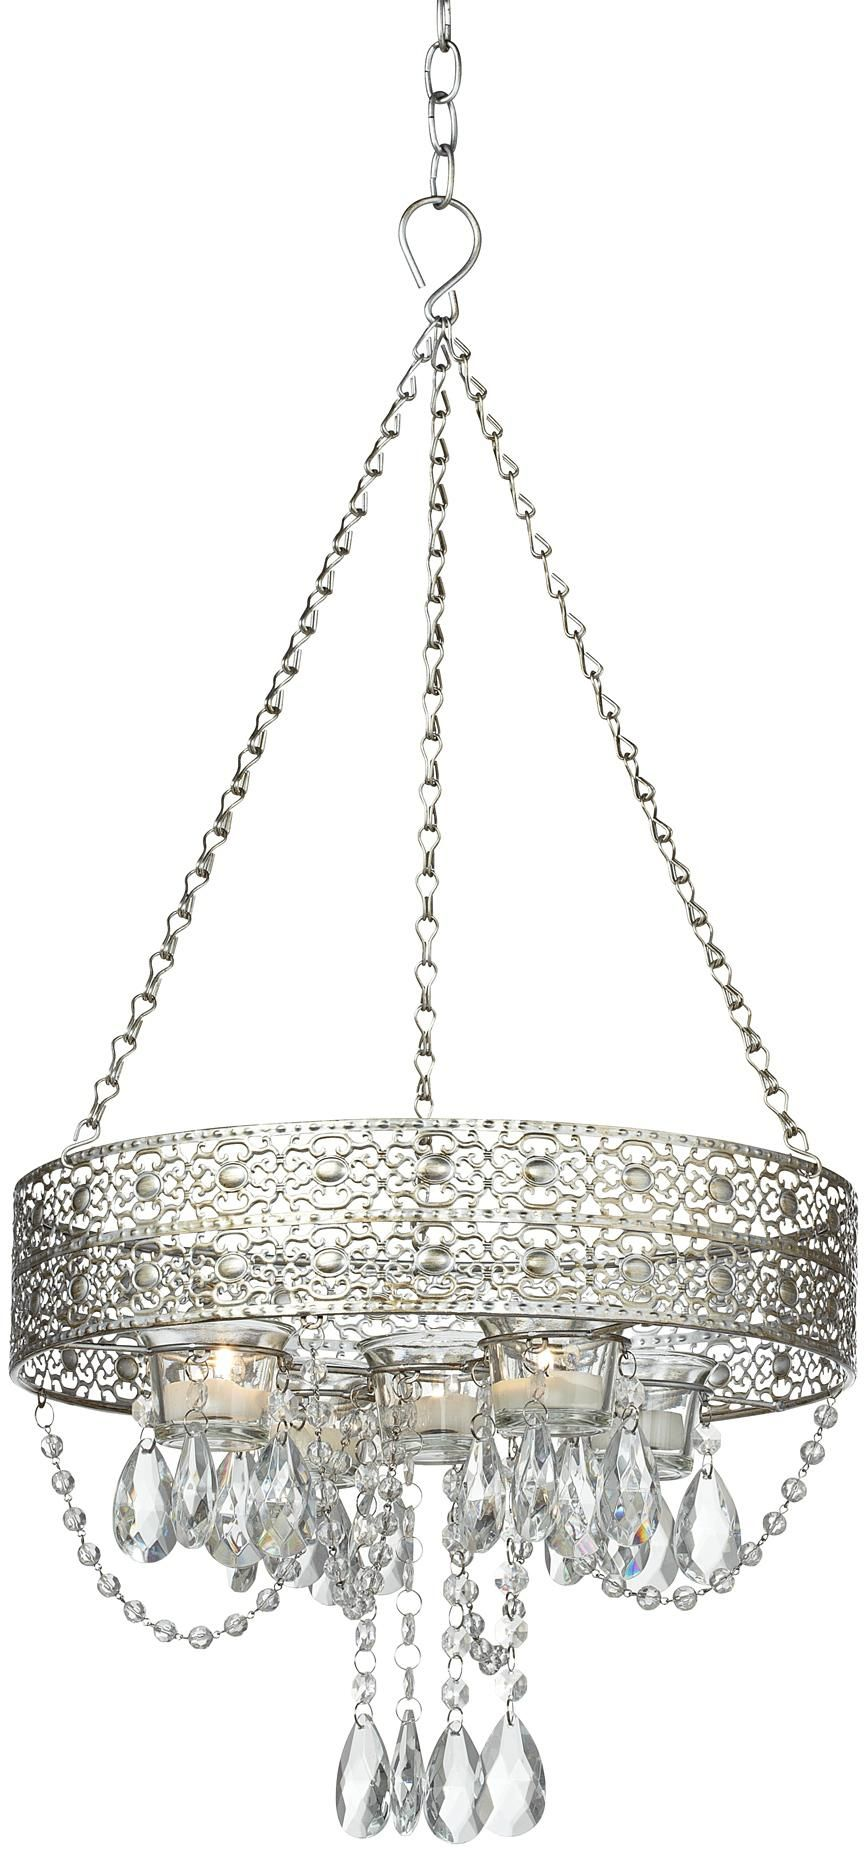 Votive hanging antique silver candle holder wedding stuff